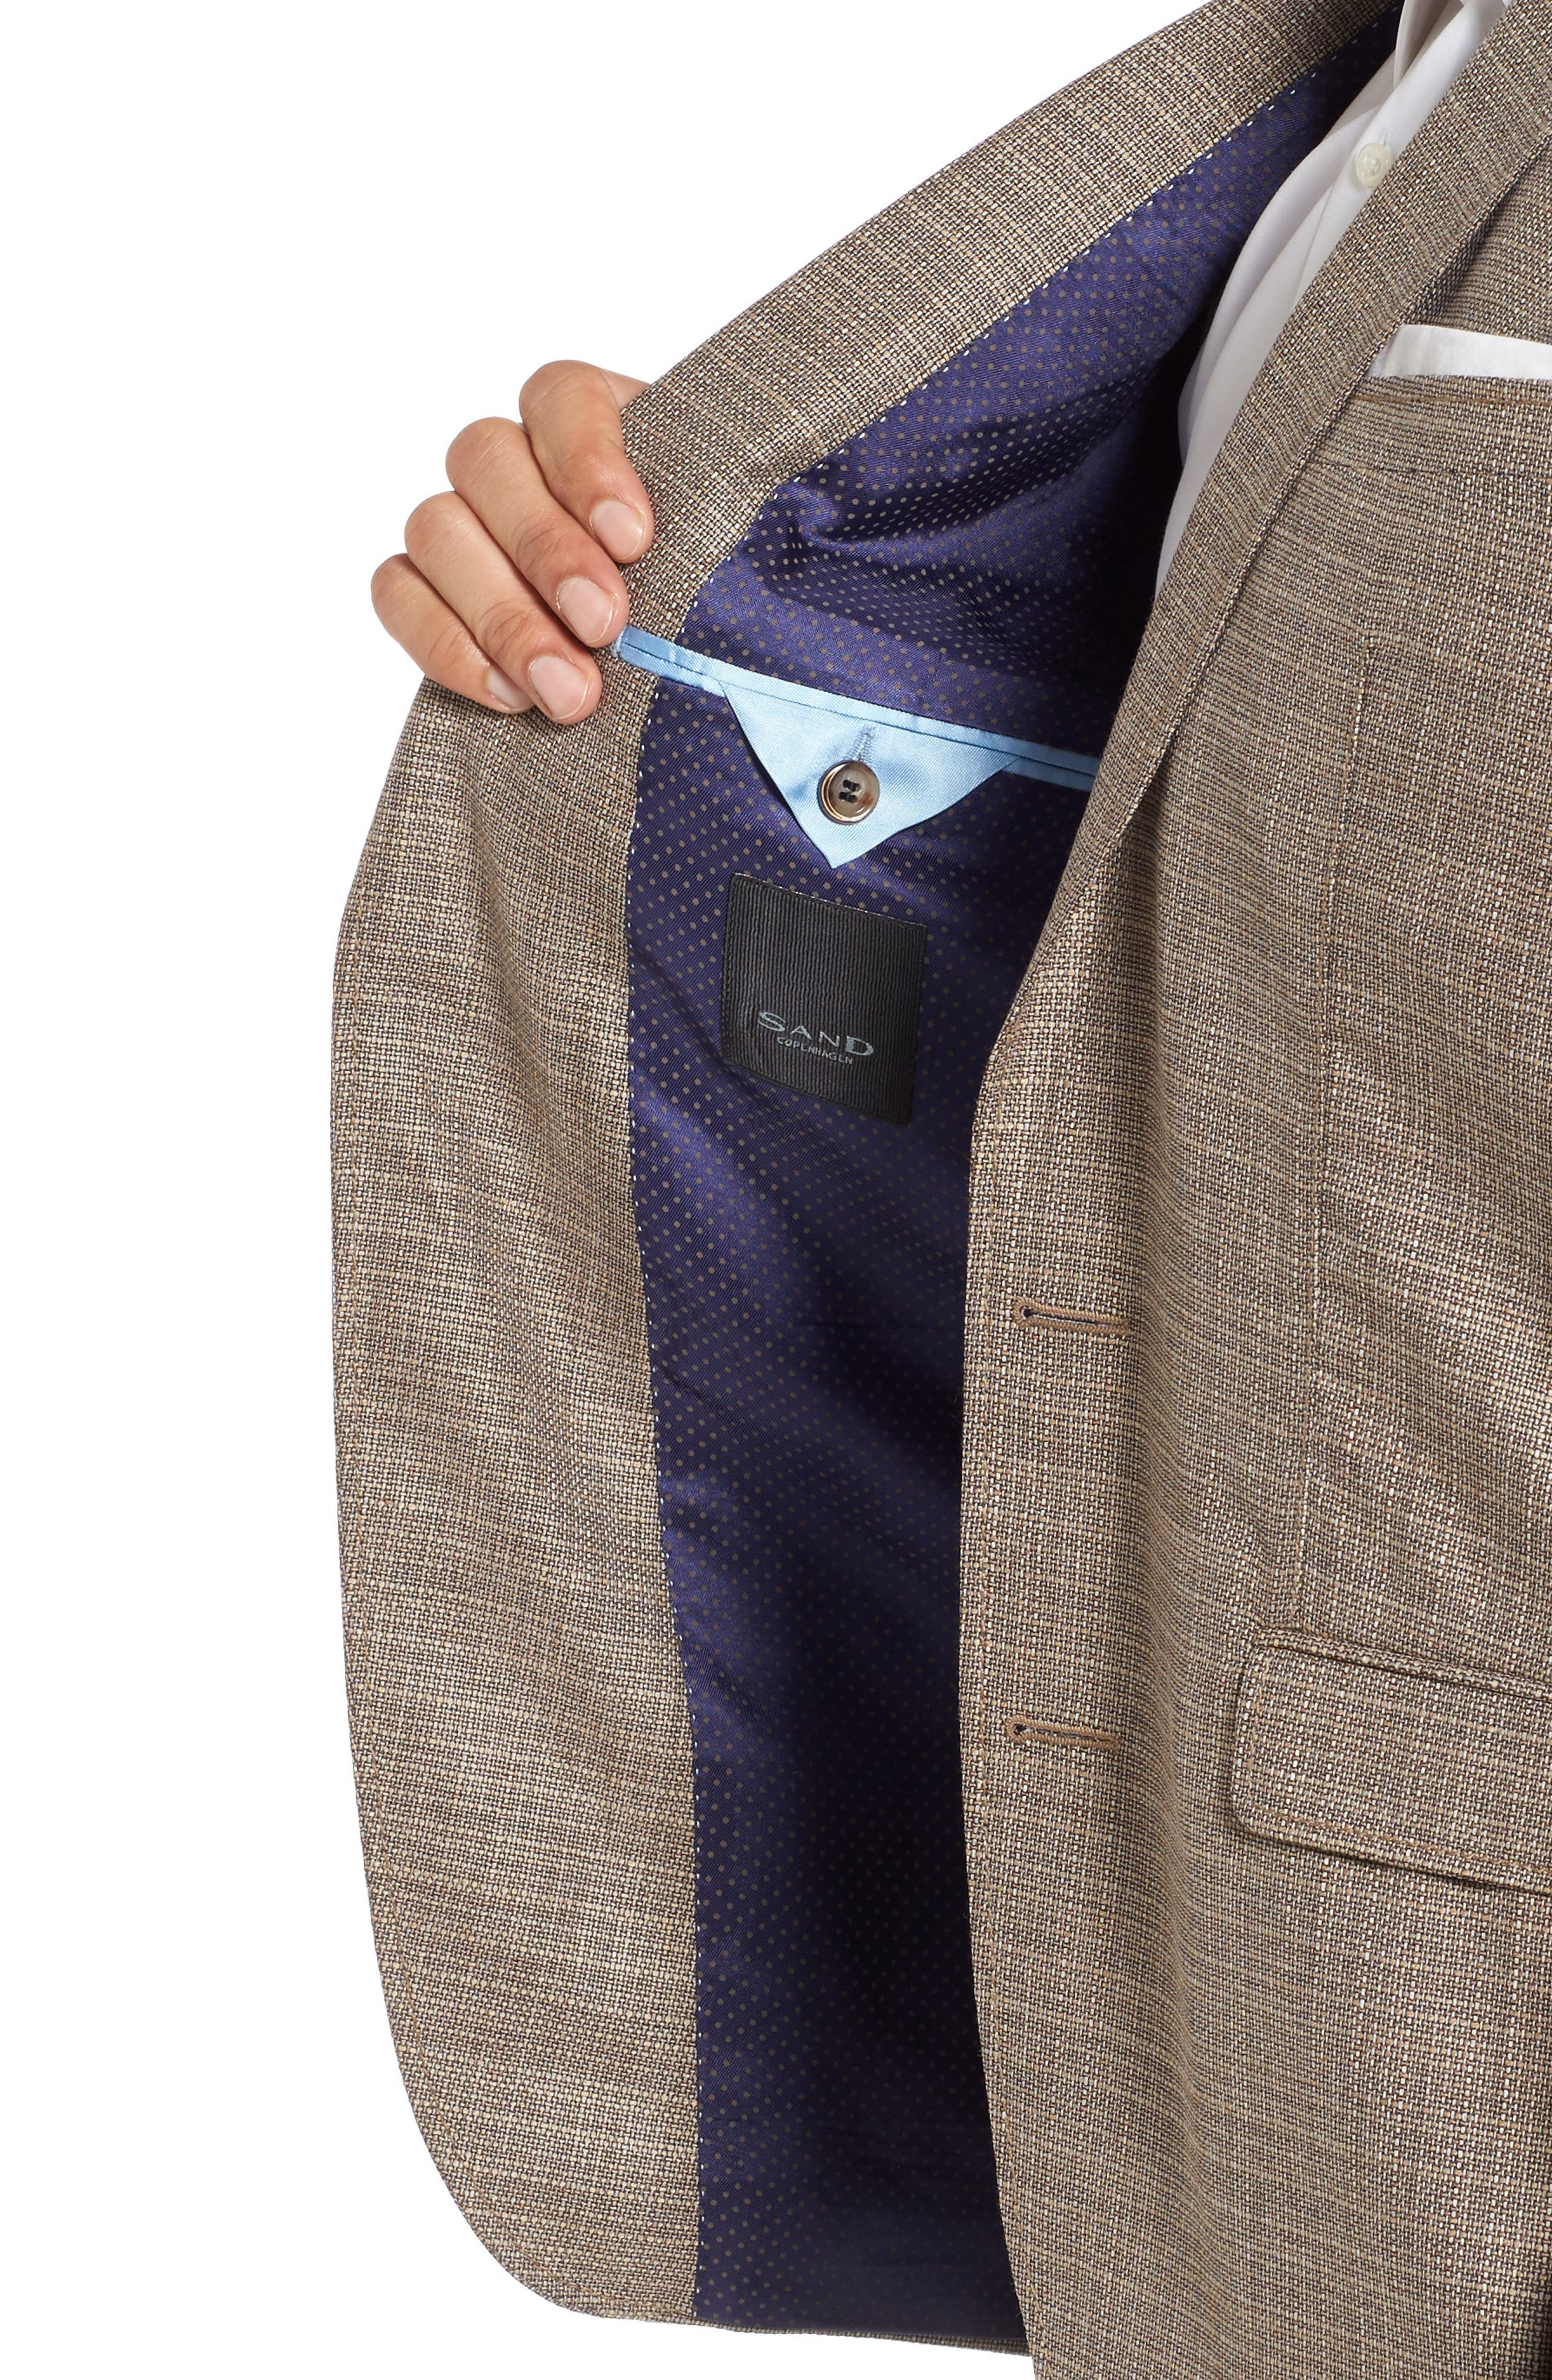 Trim Fit Wool Blazer,                             Alternate thumbnail 4, color,                             Khaki